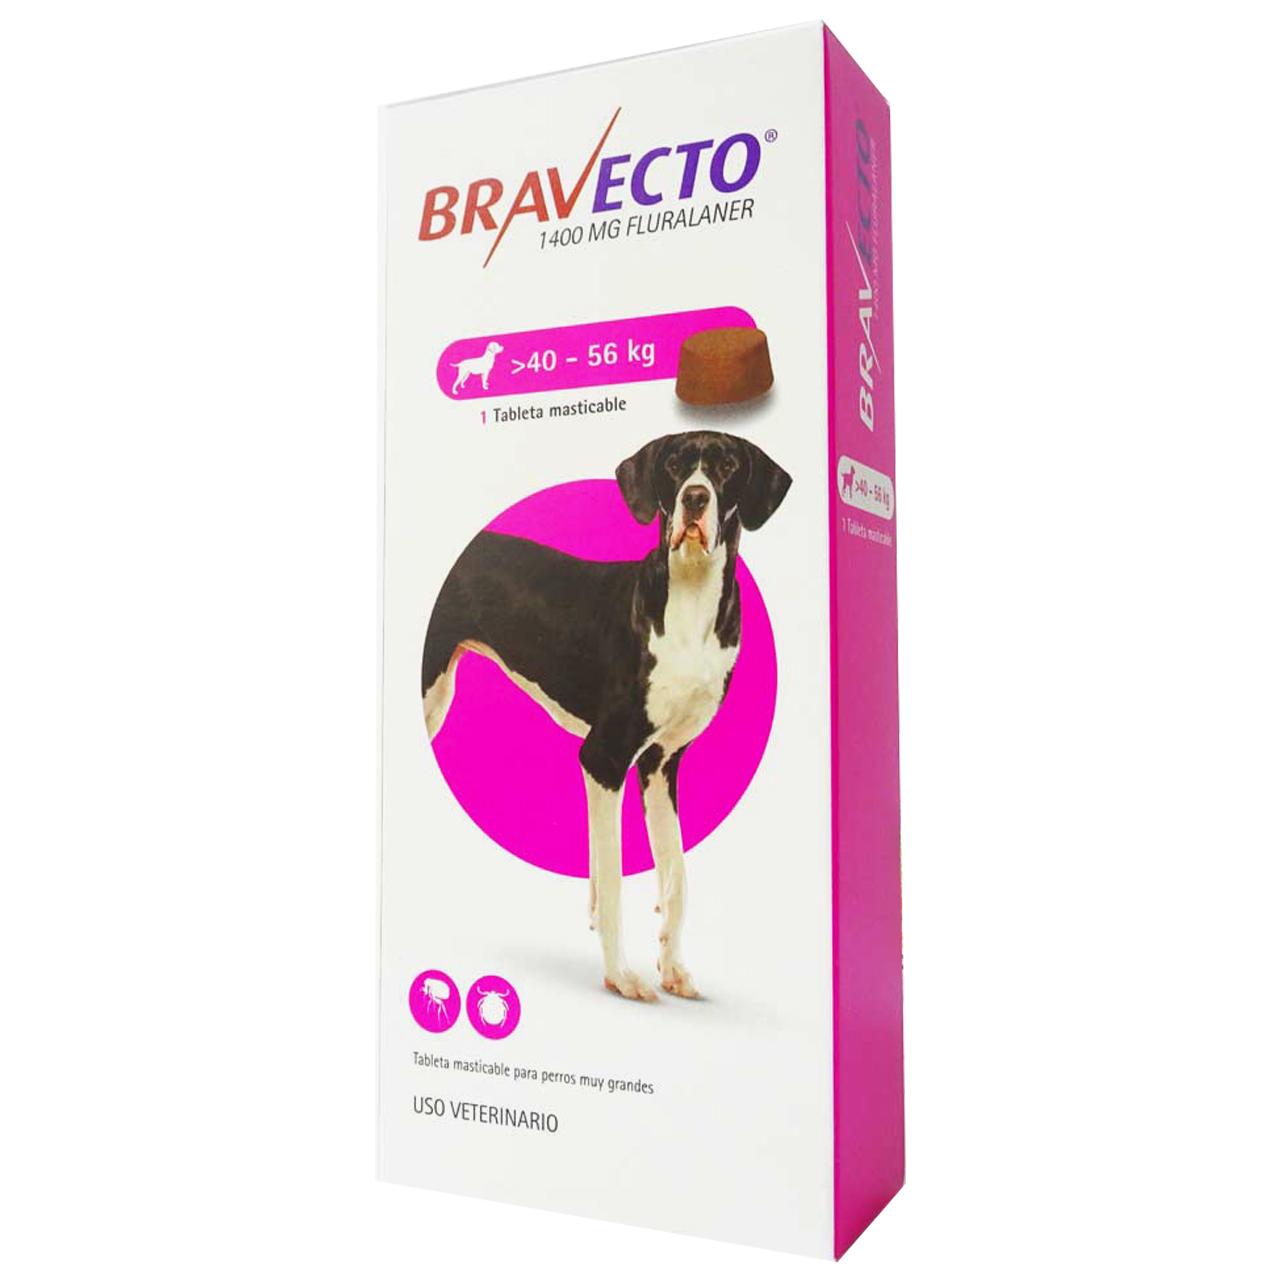 Bravecto40.jpg